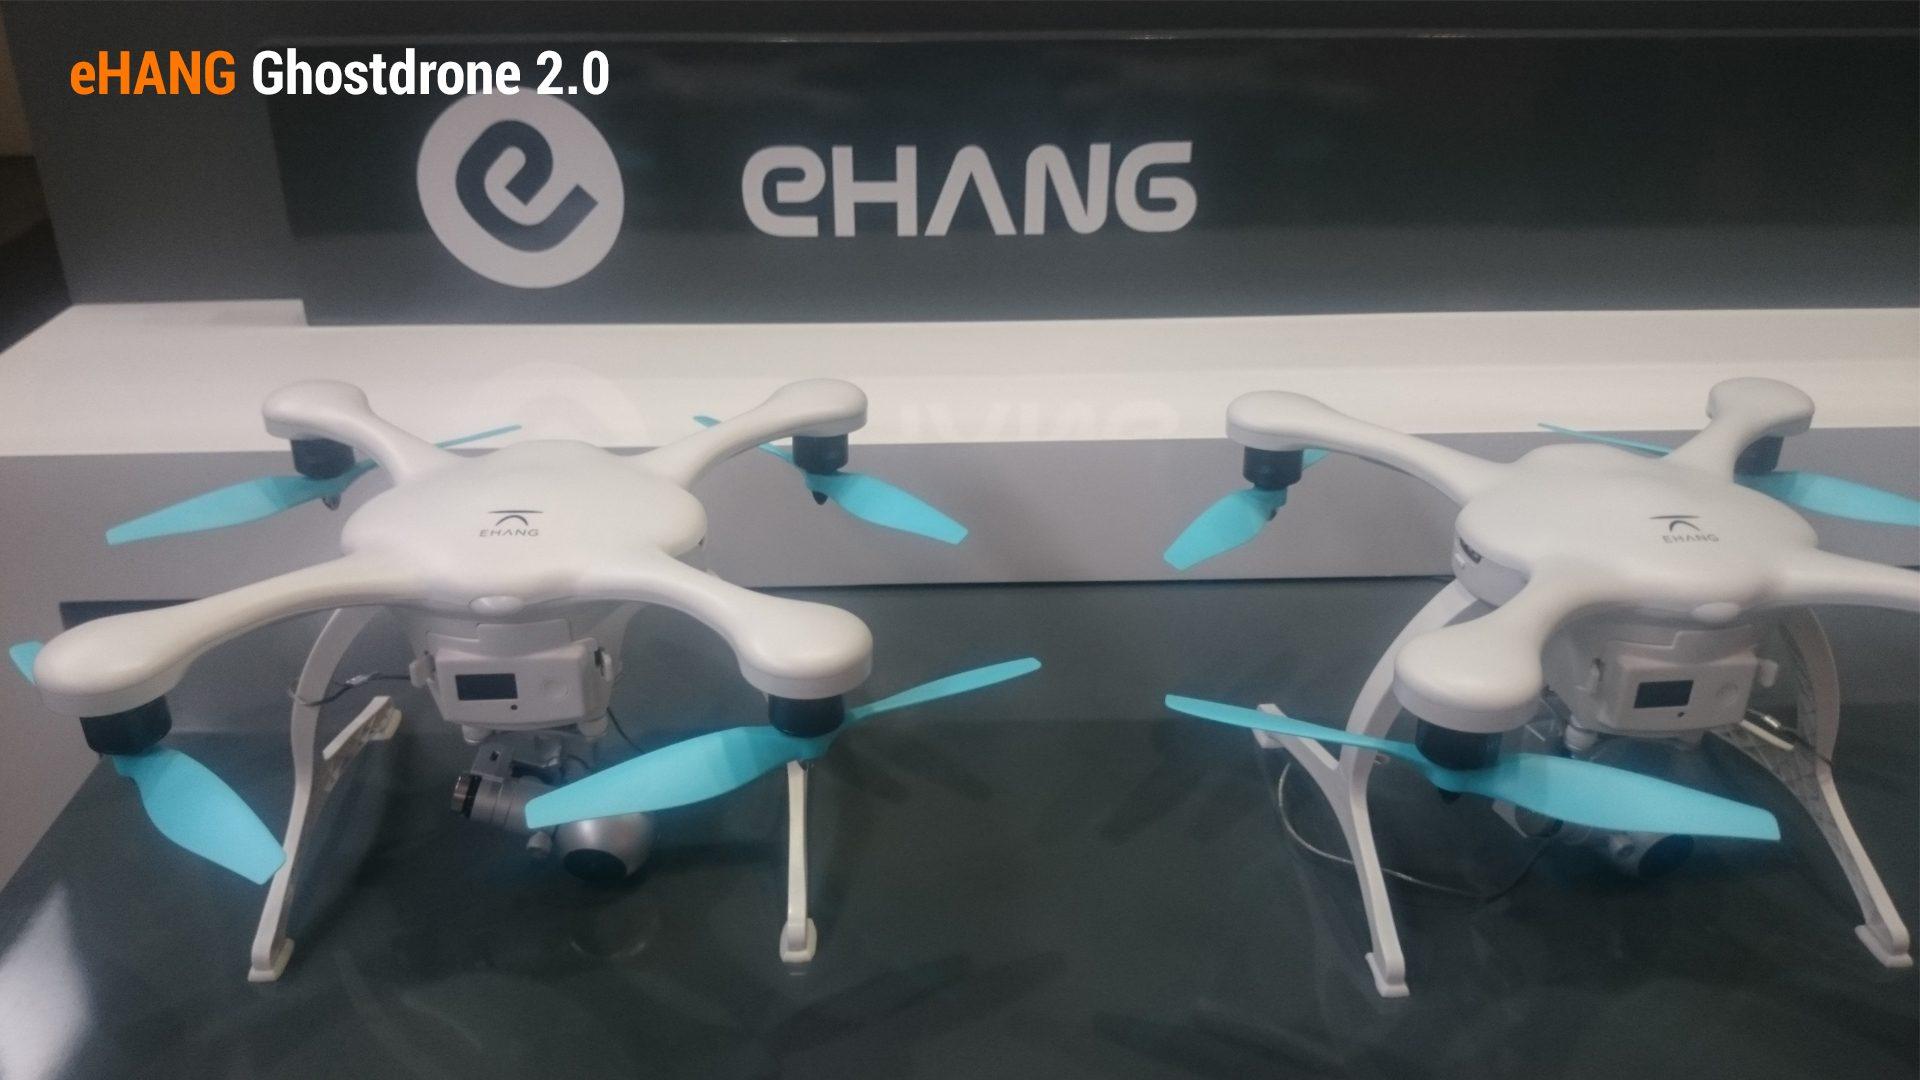 eHANG-Ghostdrone-2.0